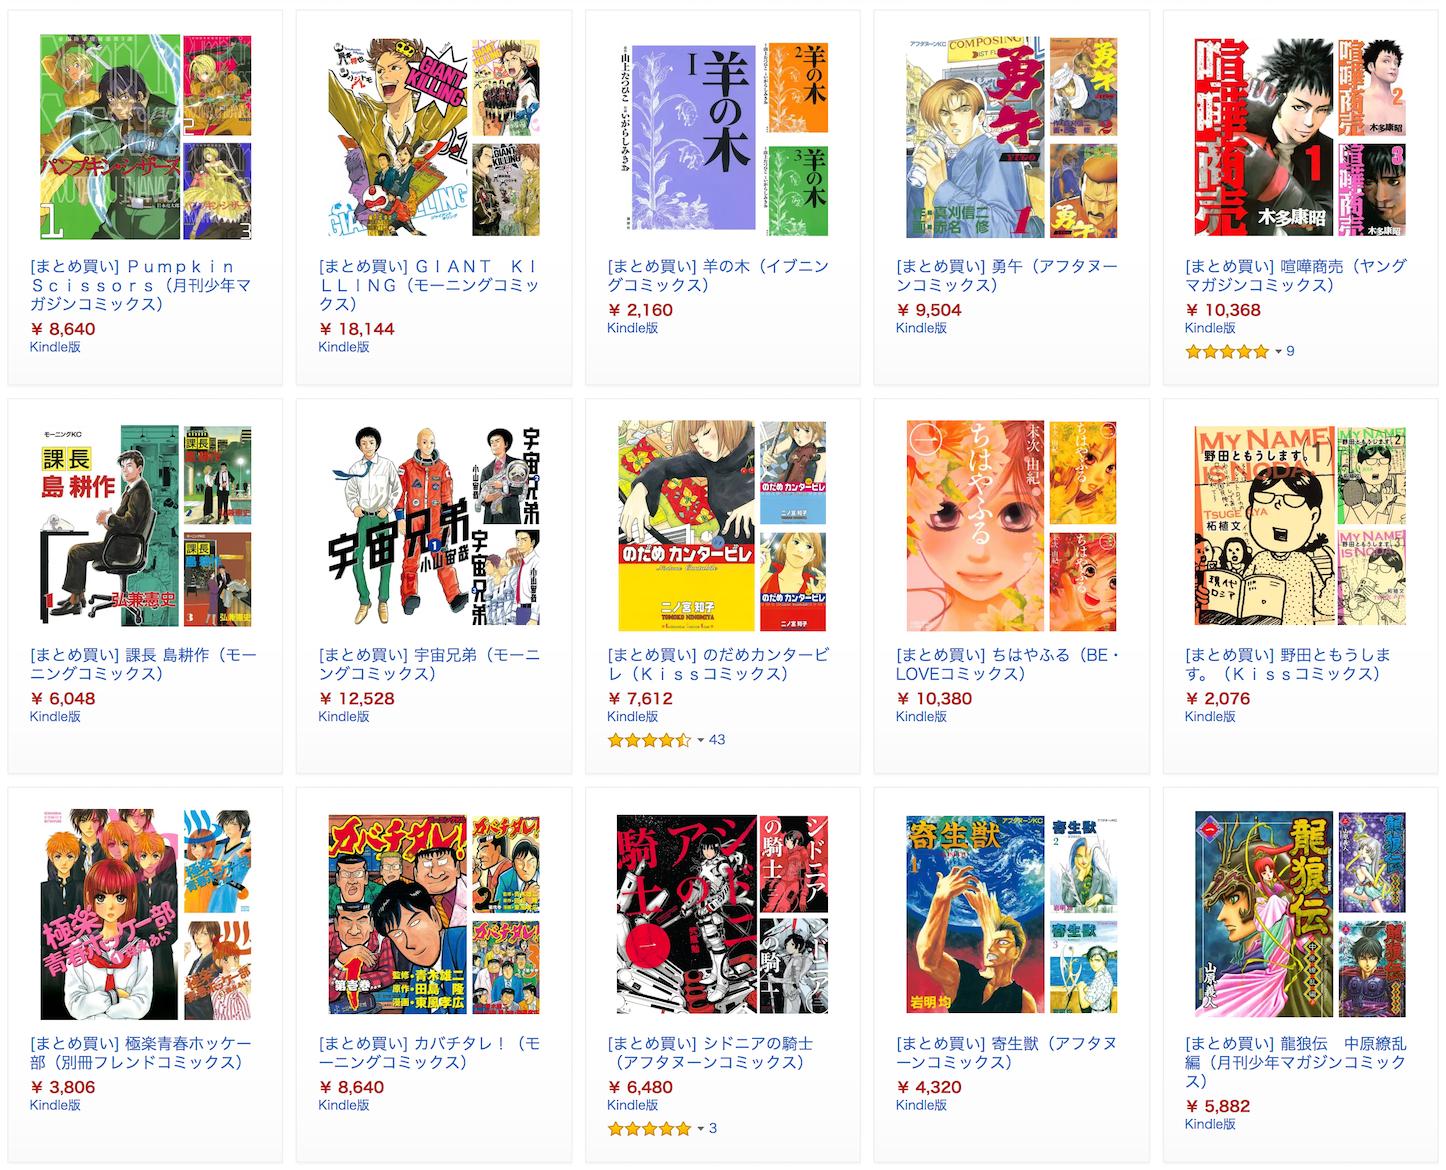 Kindle-Store-Matome-Kodansha.png